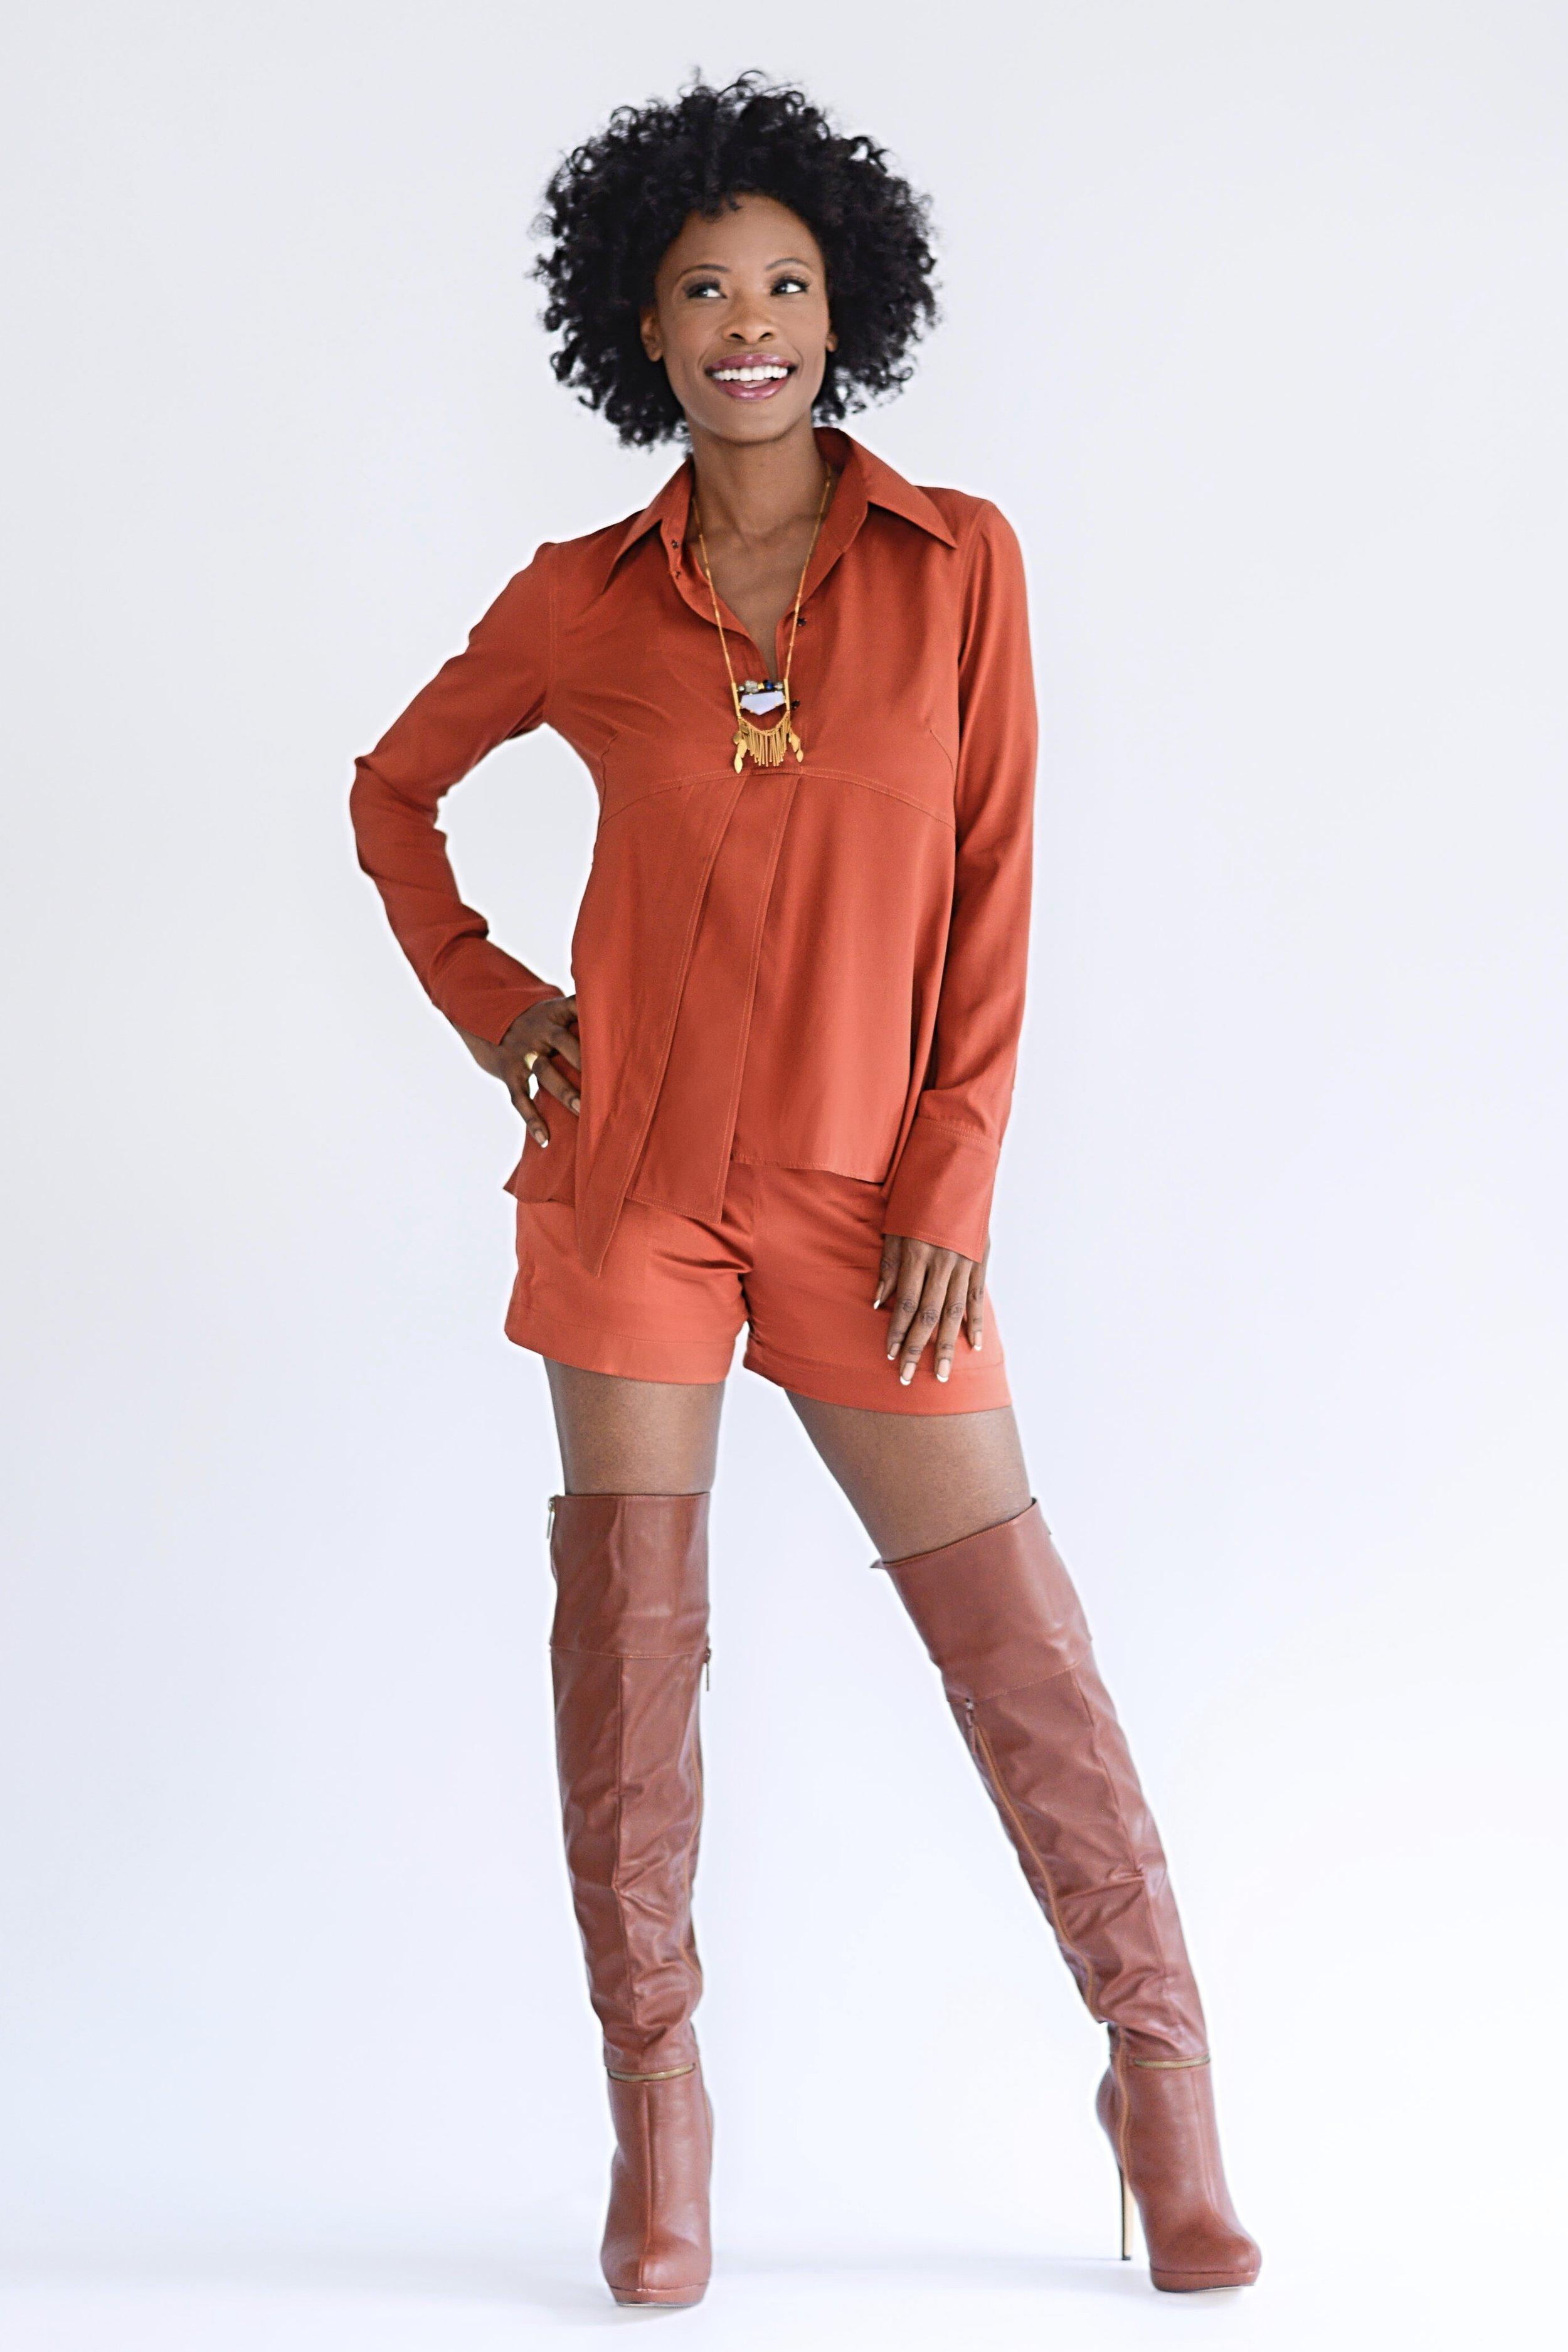 Karimah-Westbrook_Empowering-Style_2.jpg